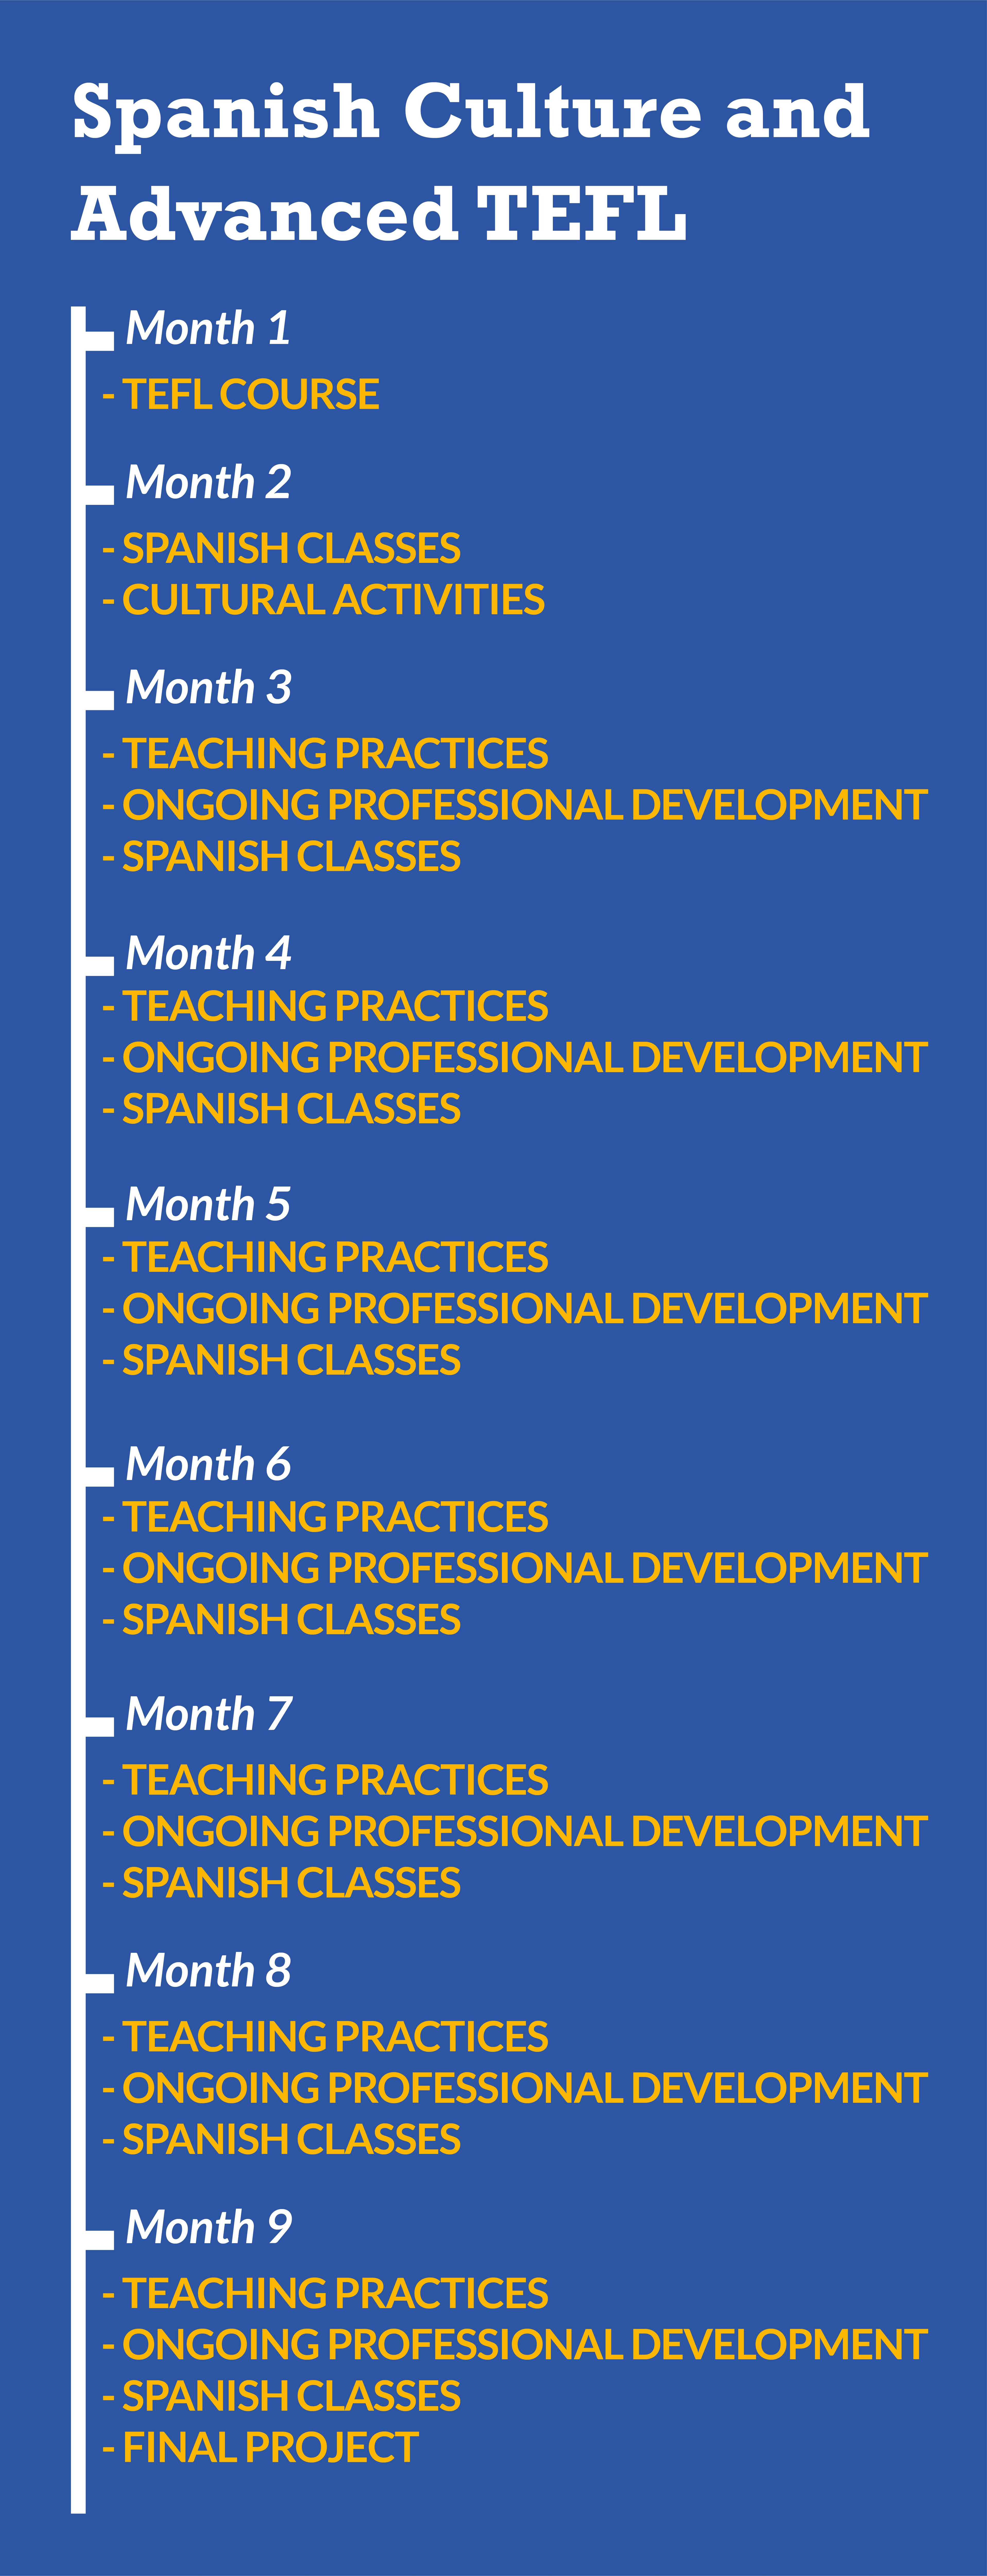 Spanish Culture and Advanced TEFL